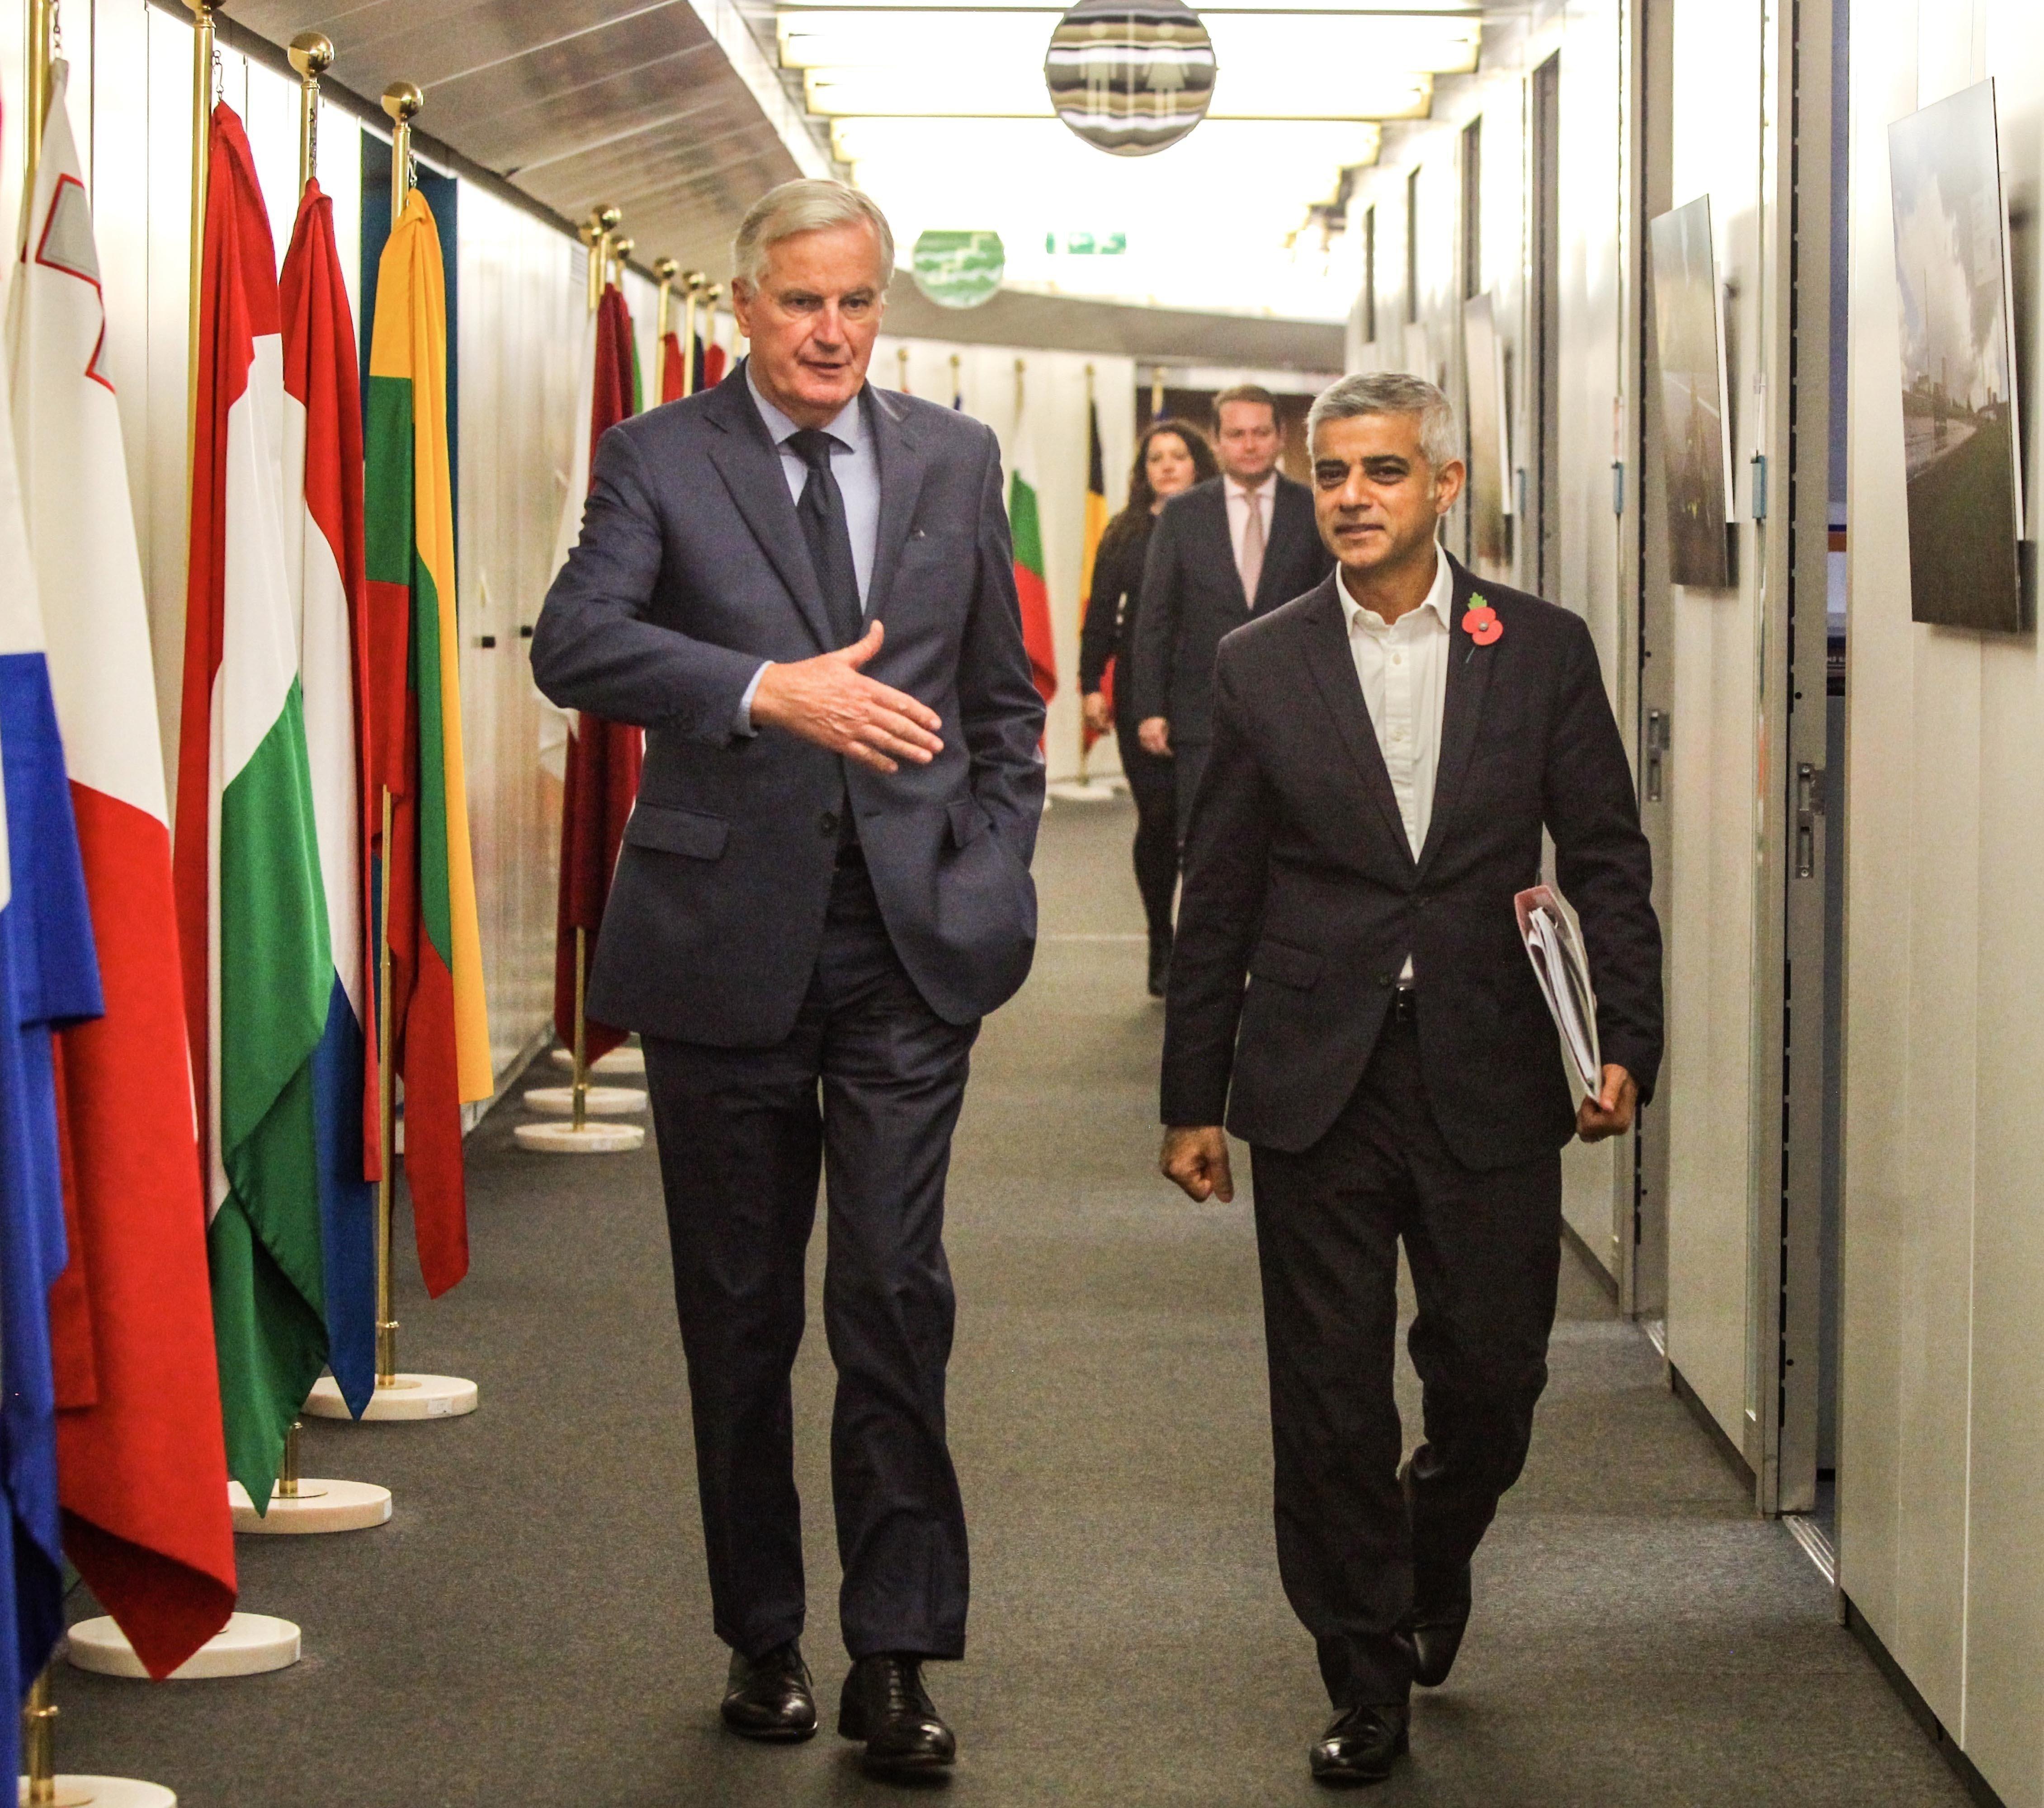 EU 'Willing To Listen' On Extending Brexit Deal Deadline, Says Sadiq